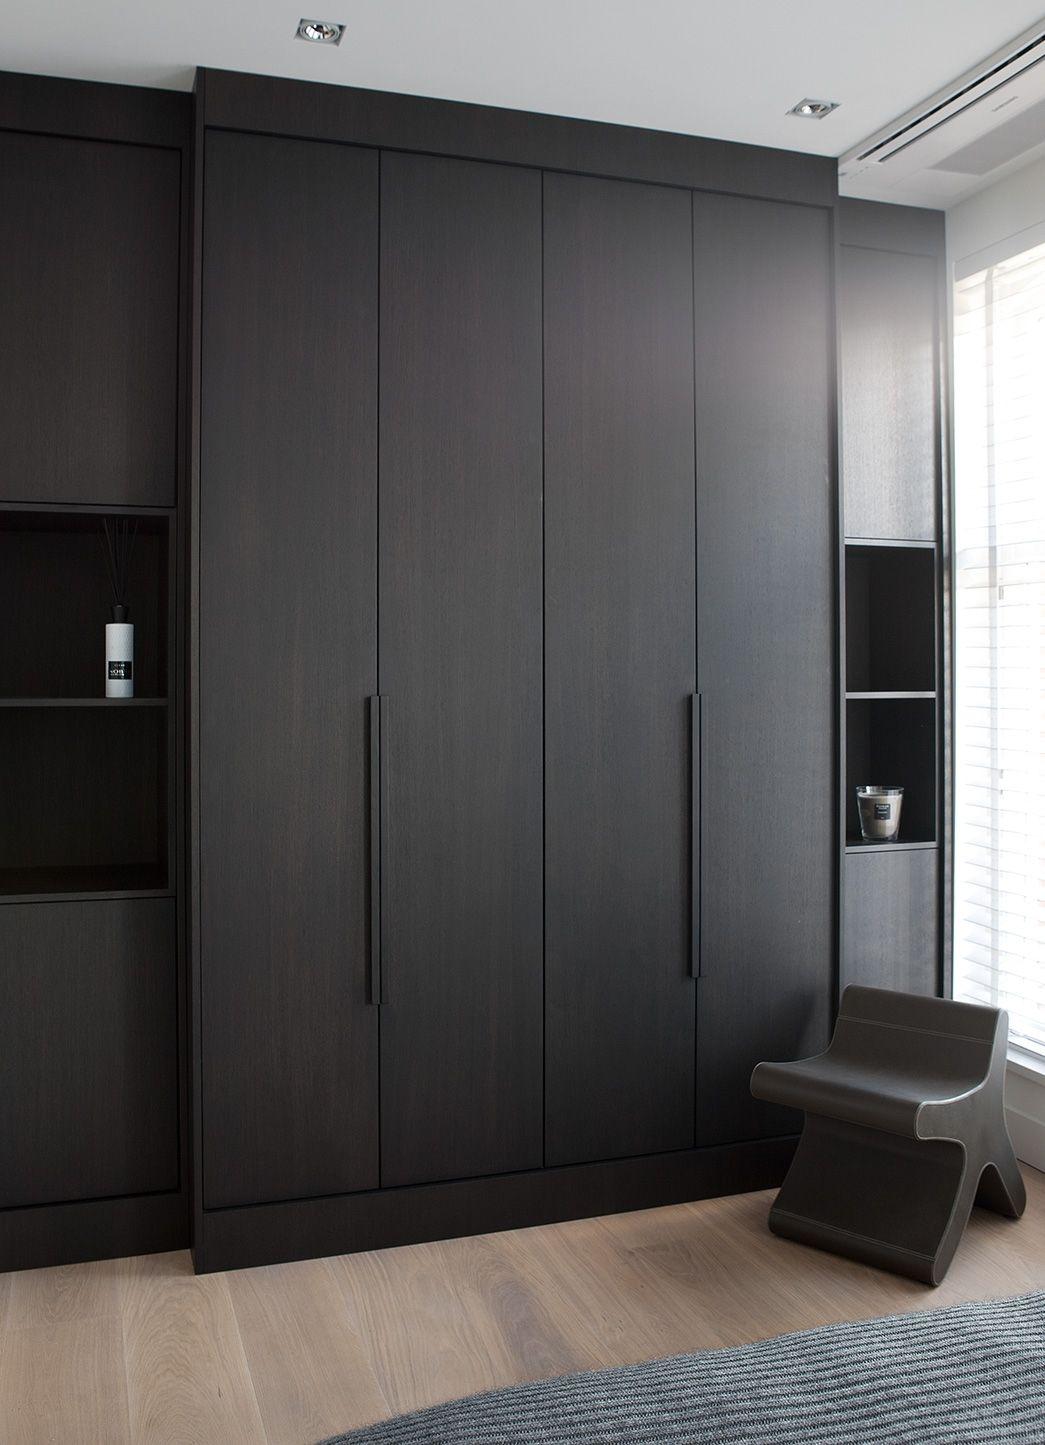 Garderobekasten ontwerp mees hurkmans realisatie for Roperos para dormitorios modernos